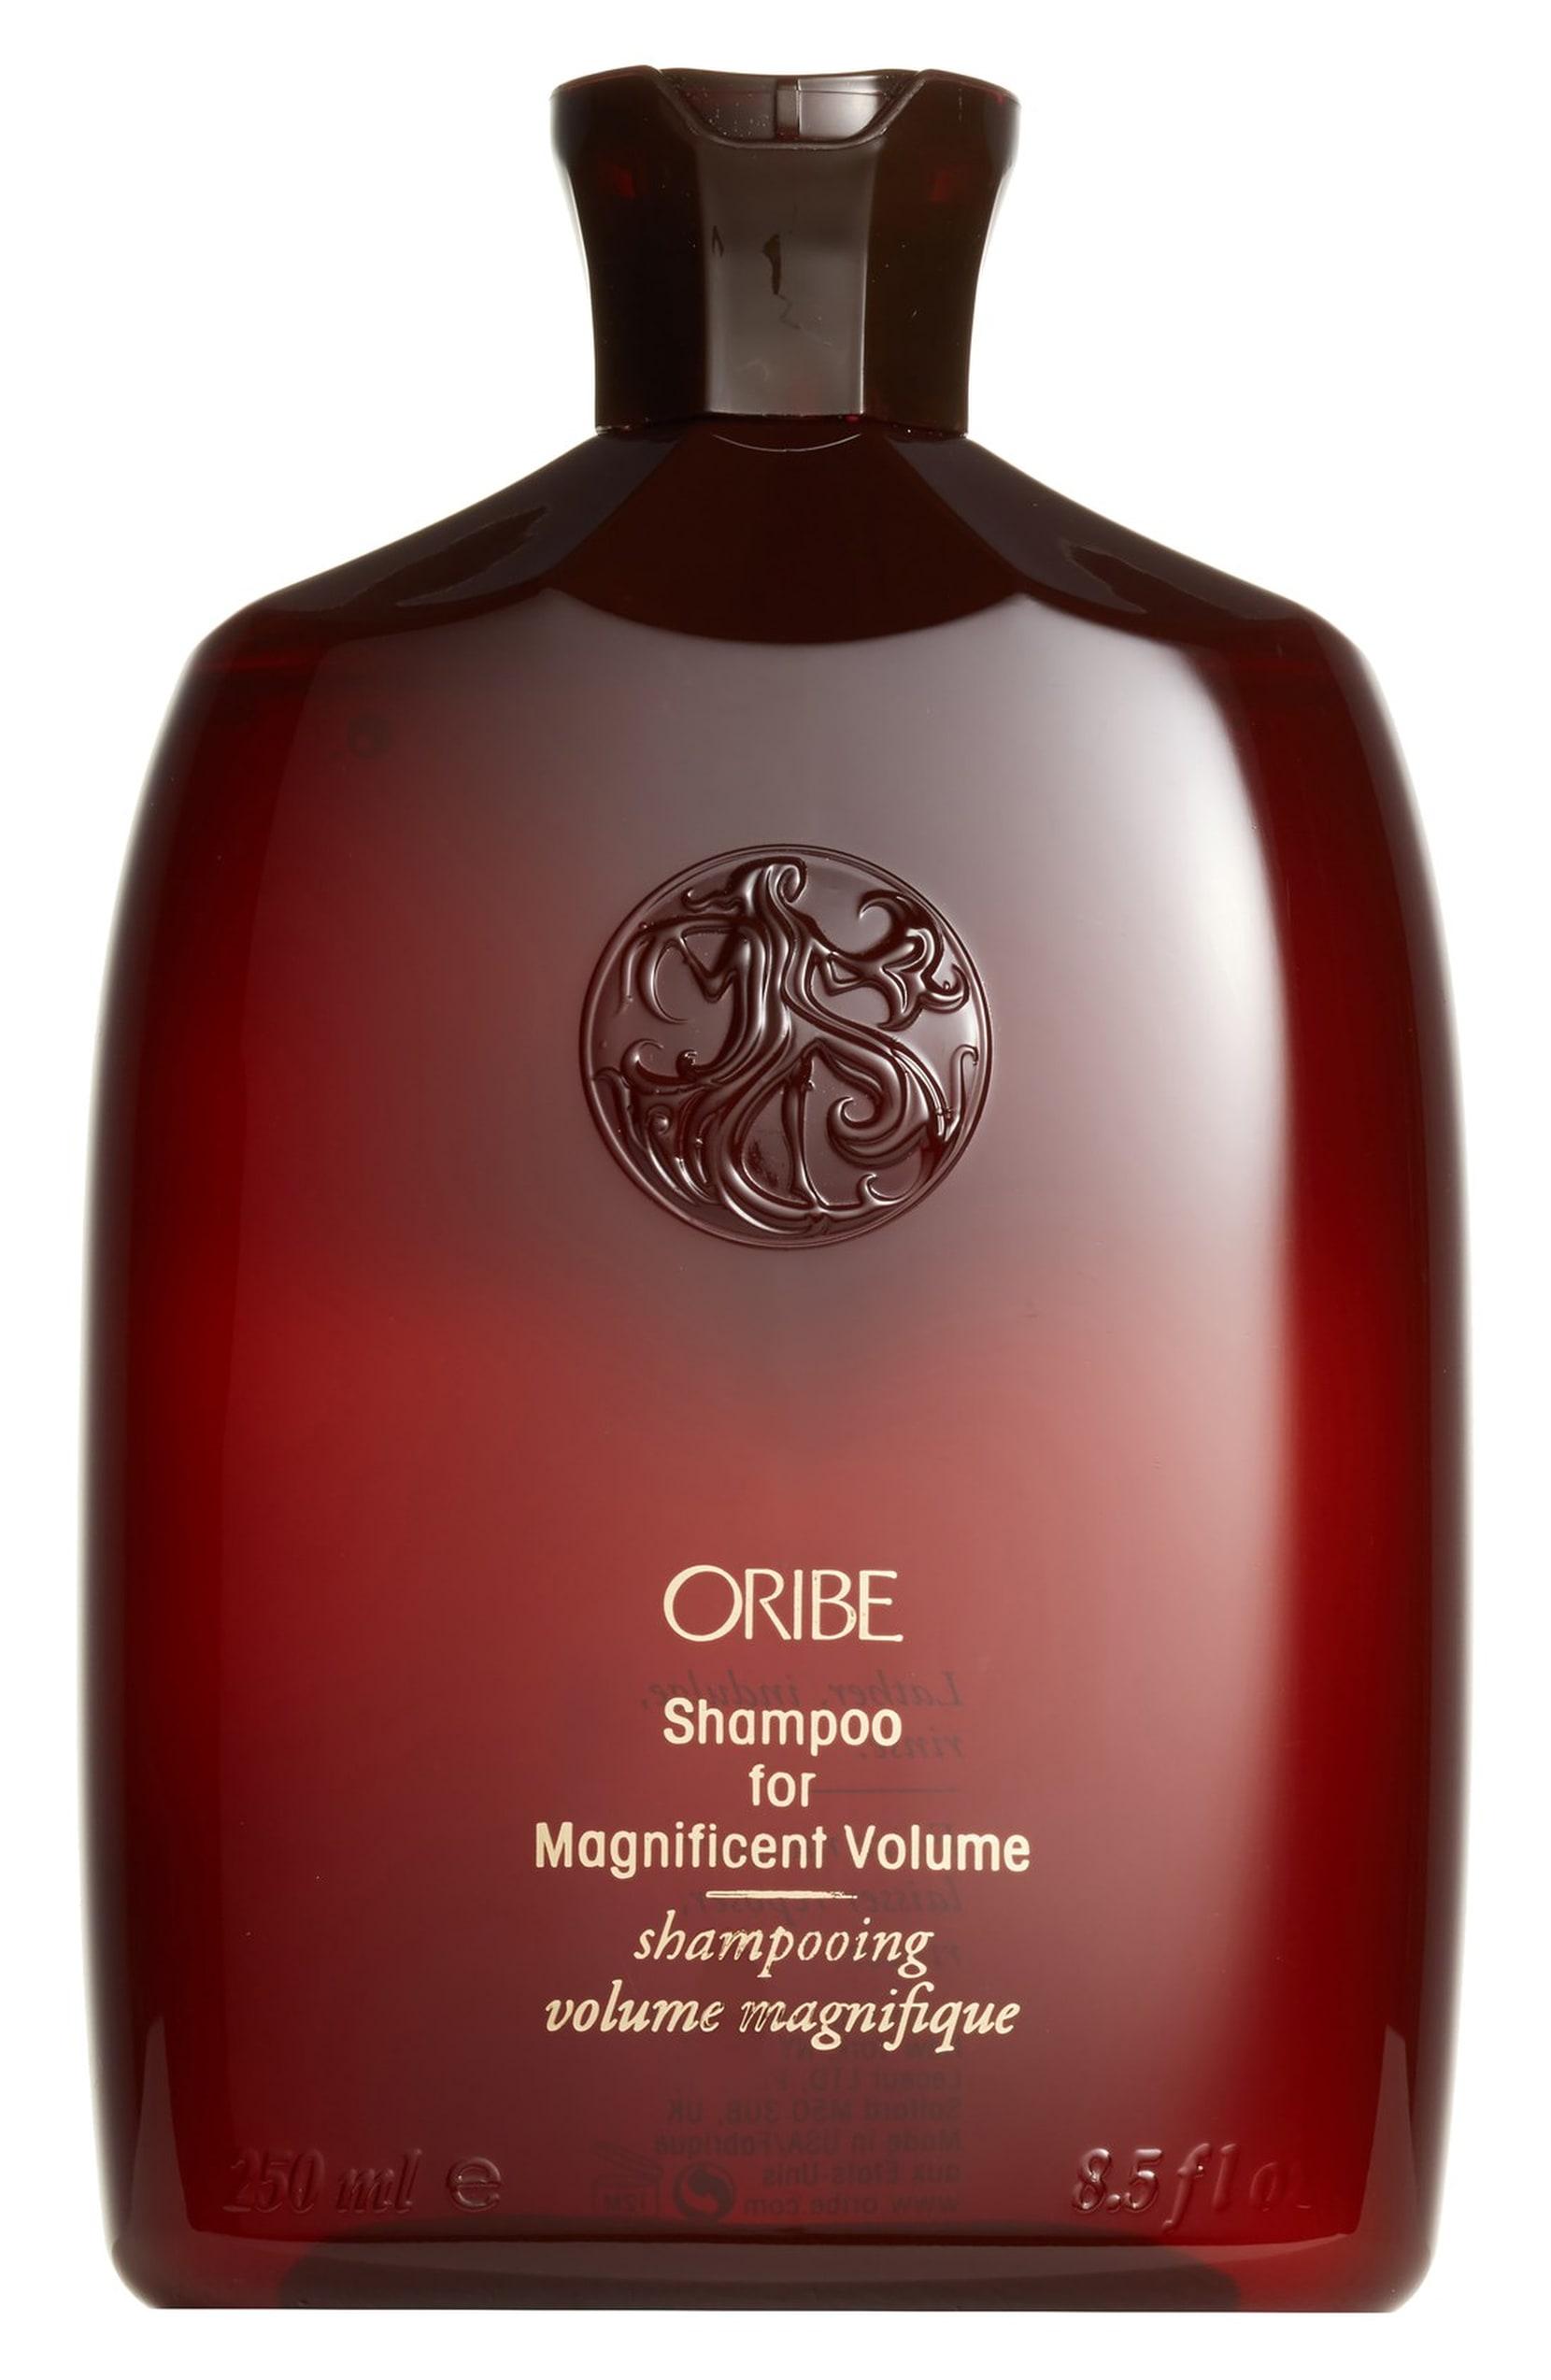 FAVORITE shampoo